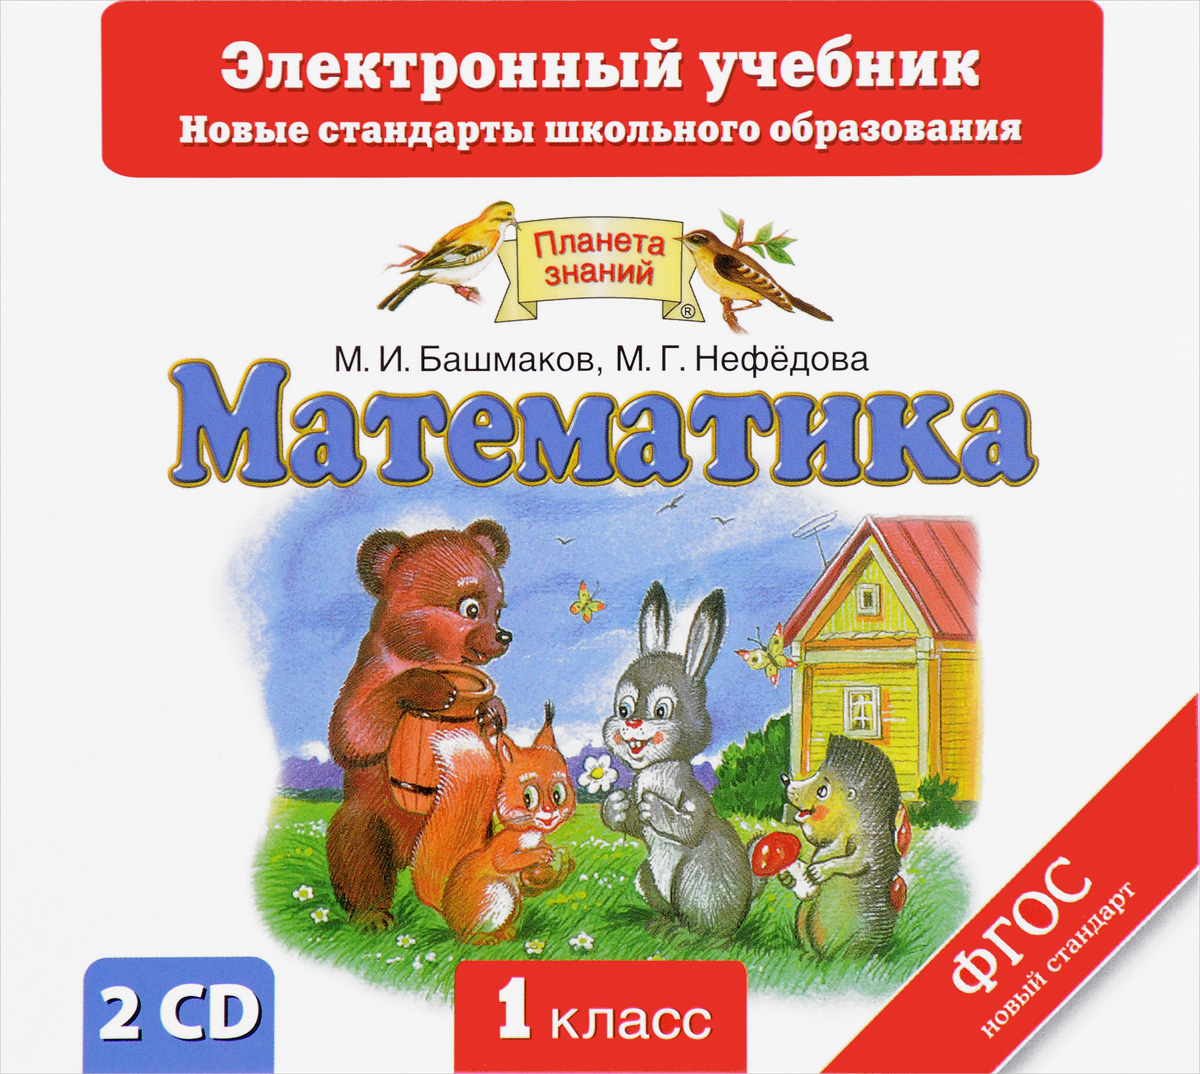 Математика. 1 класс. Электронный учебник (2 CD)